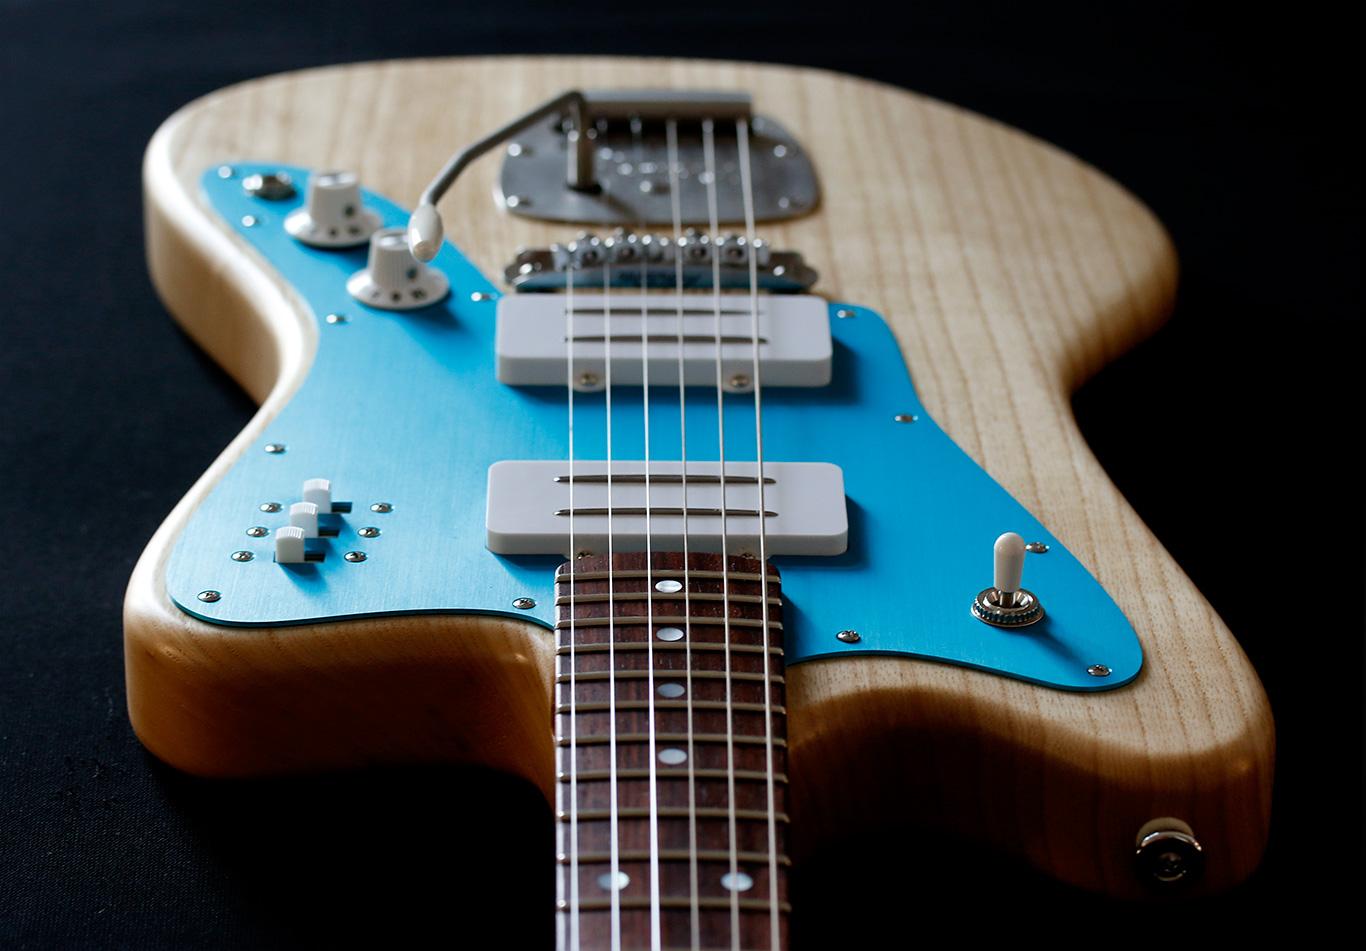 Deimel Firestar »Natural Satin« w/ »Turquoise« aluminum anodized pickguard